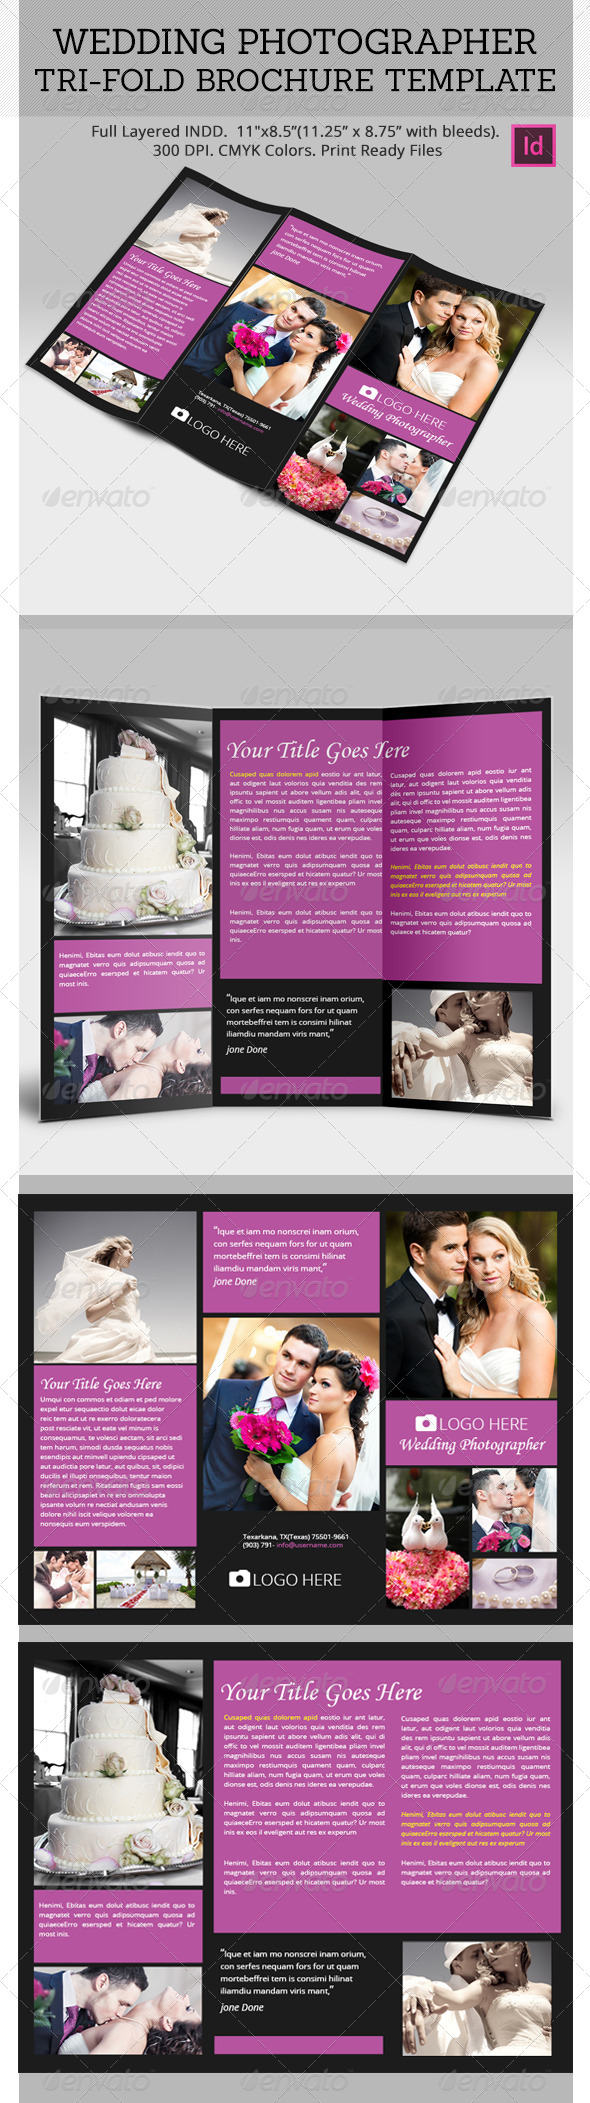 Weddign Photo Grapher Tri Fold Brochure Templates - Portfolio Brochures